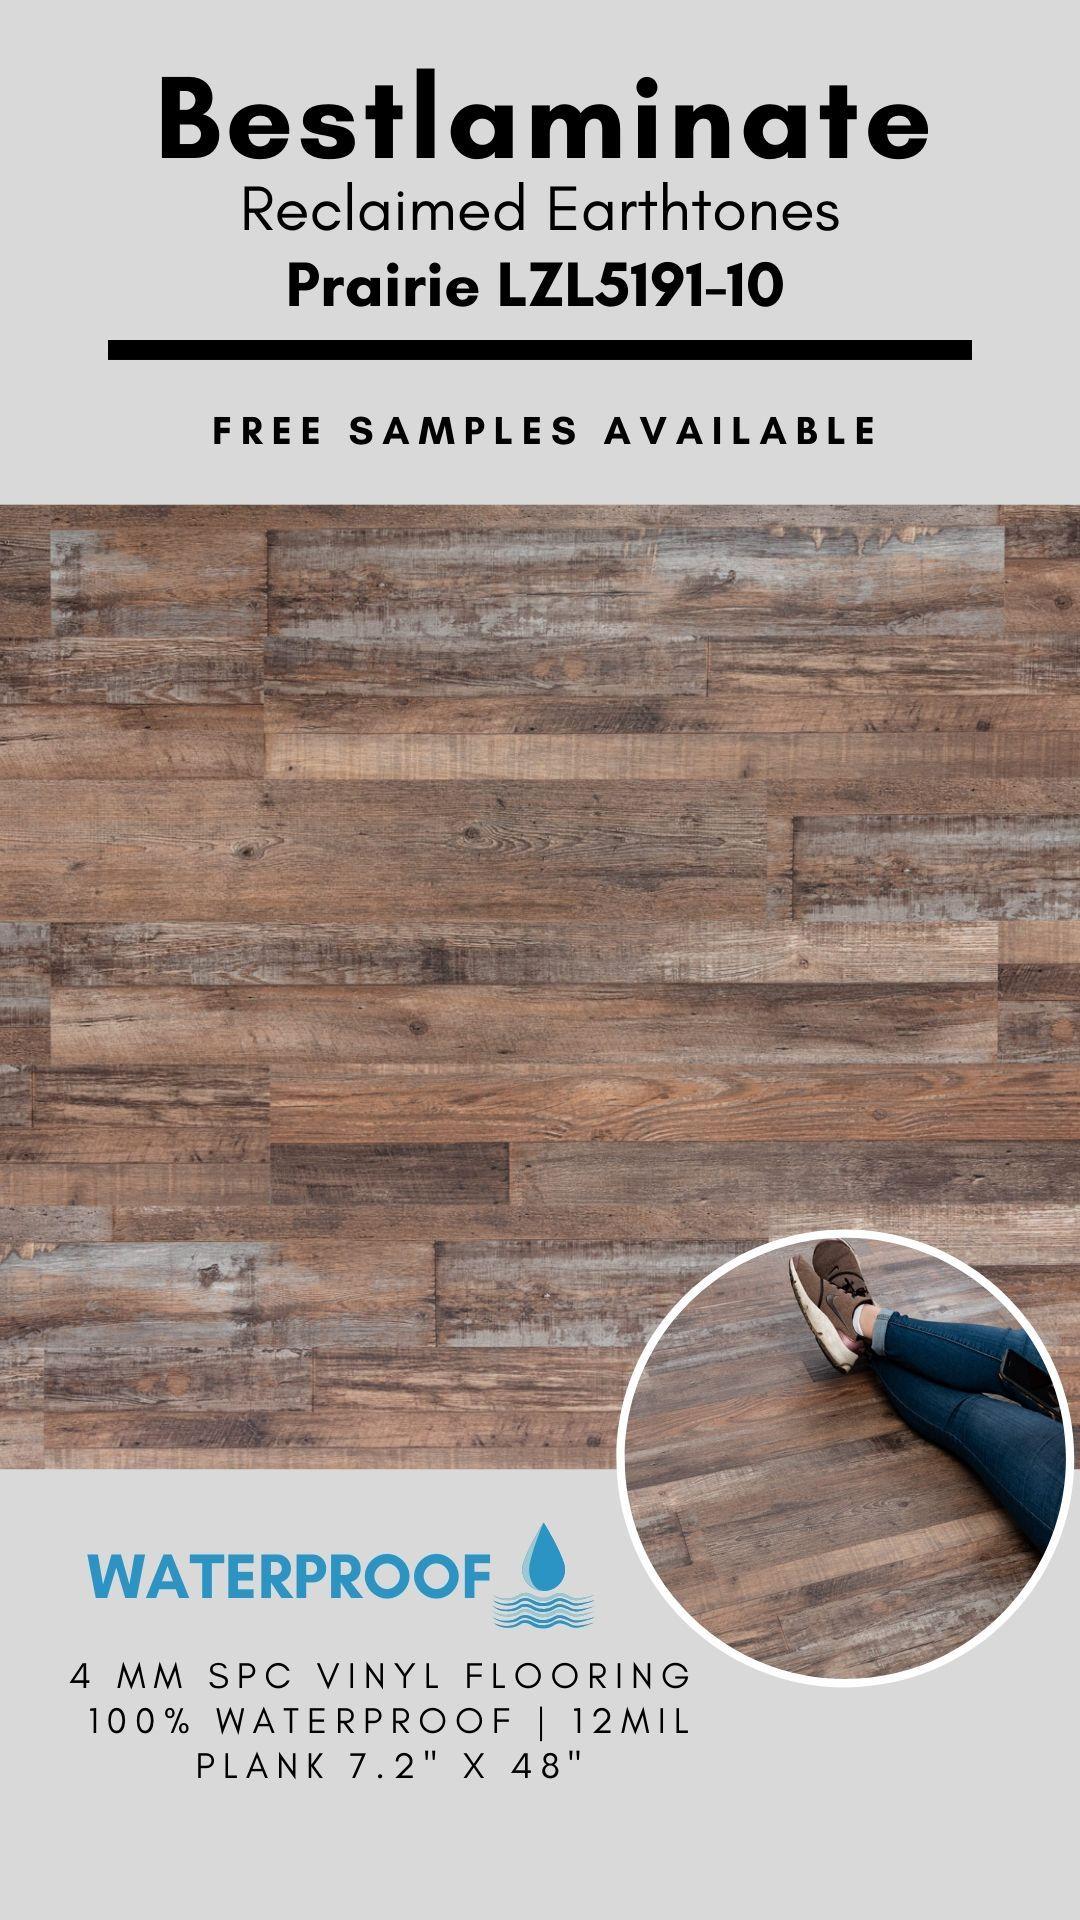 Bestlaminate Reclaimed Earthtones Prairie Lzl5191 10 Luxury Spc Vinyl Plank In 2020 Vinyl Plank Vinyl Flooring Earth Tones